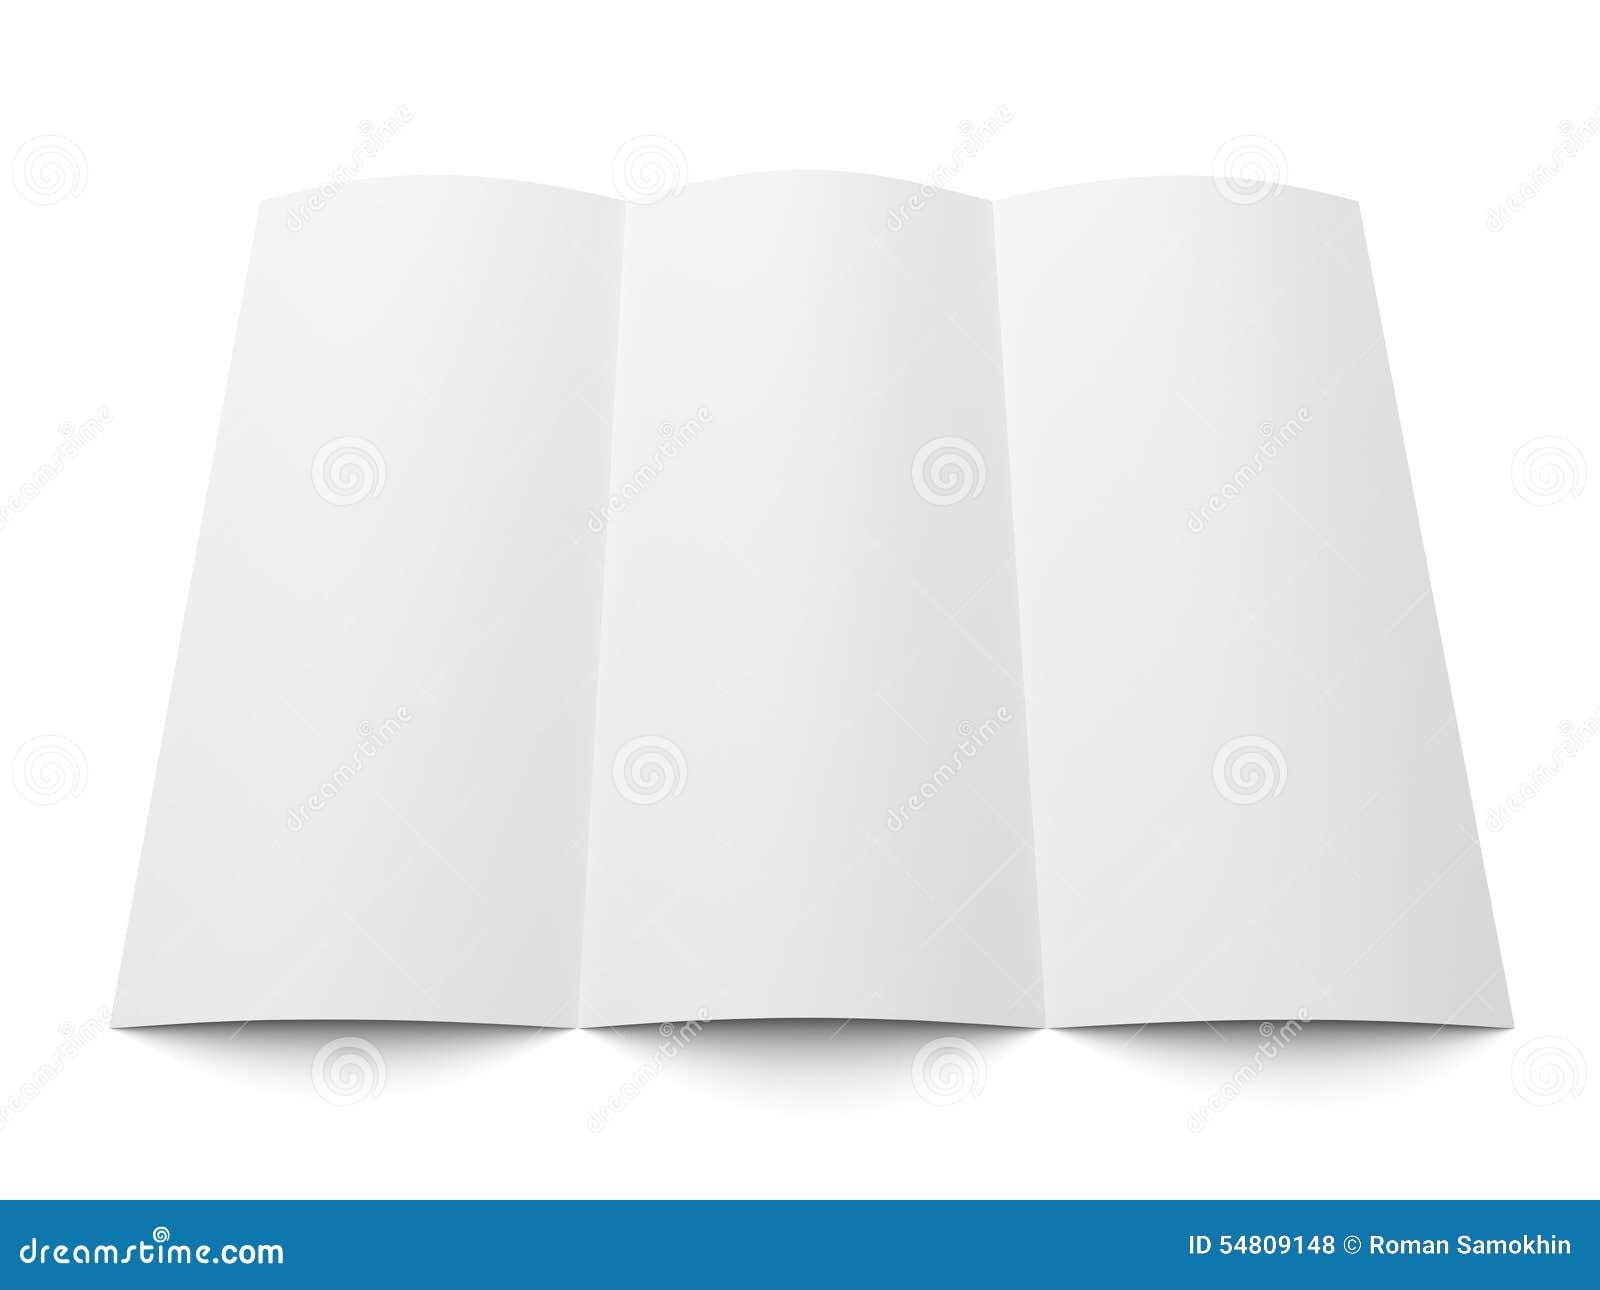 trendy tri fold brochure template design stock vector illustration